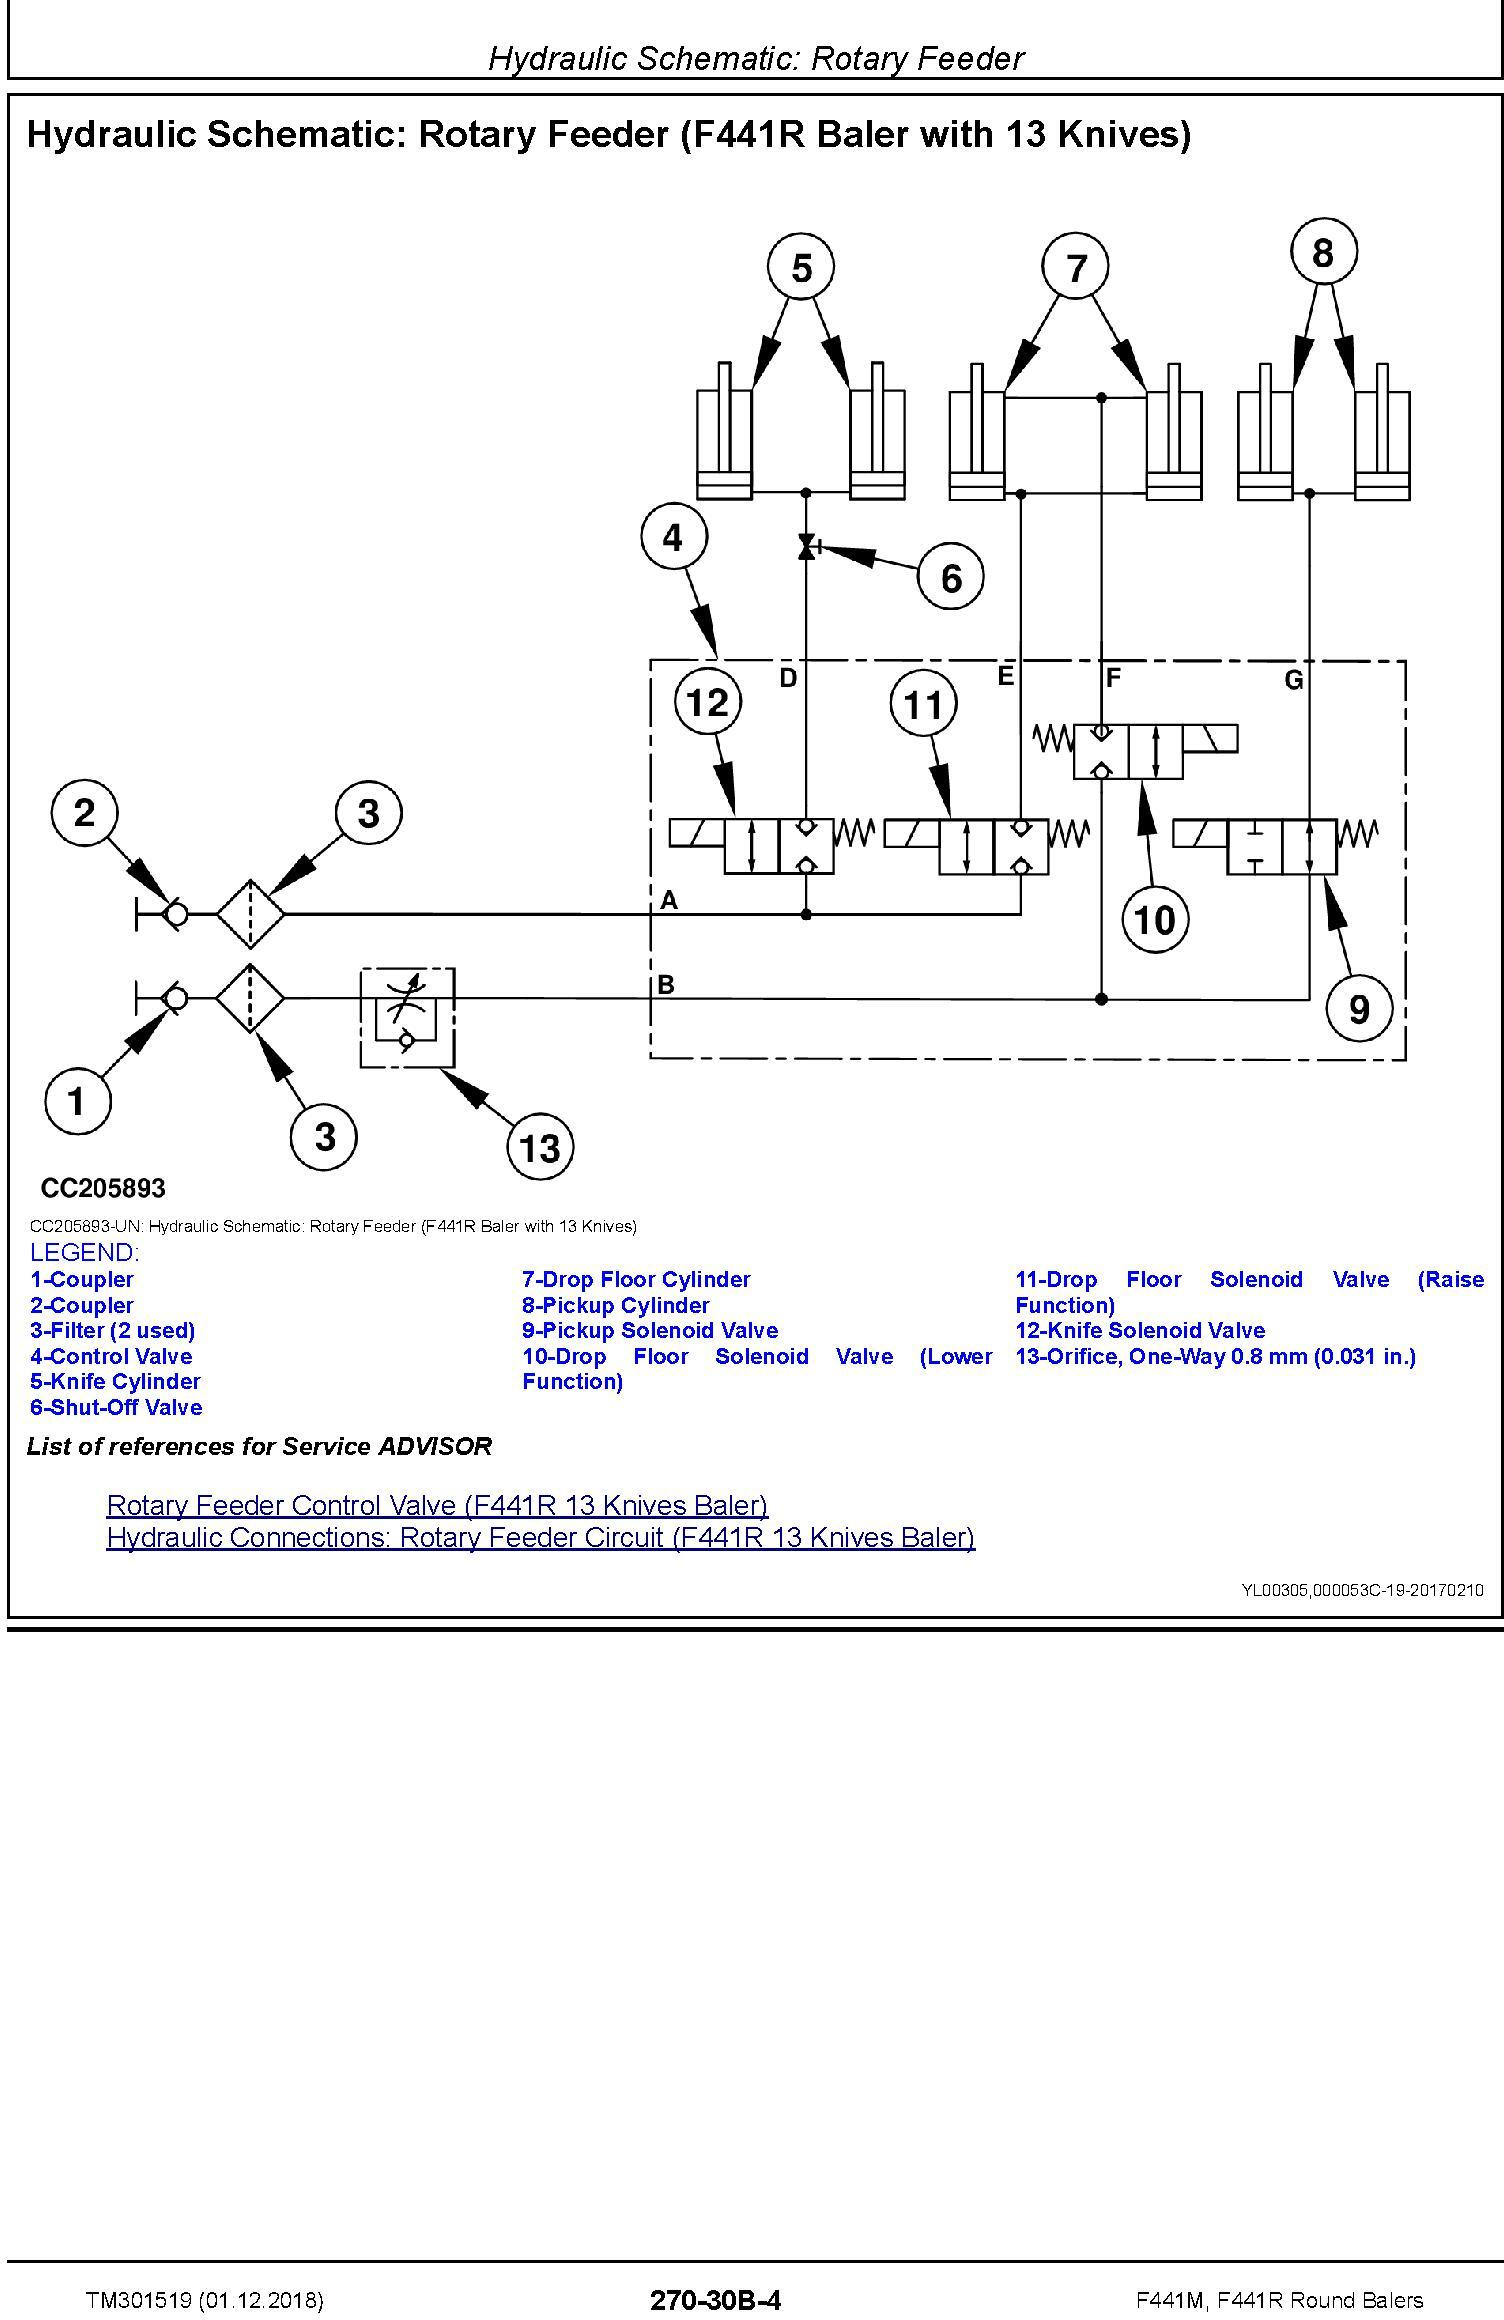 John Deere F441M, F441R Round Balers Diagnostic Technical Service Manual (TM301519) - 2